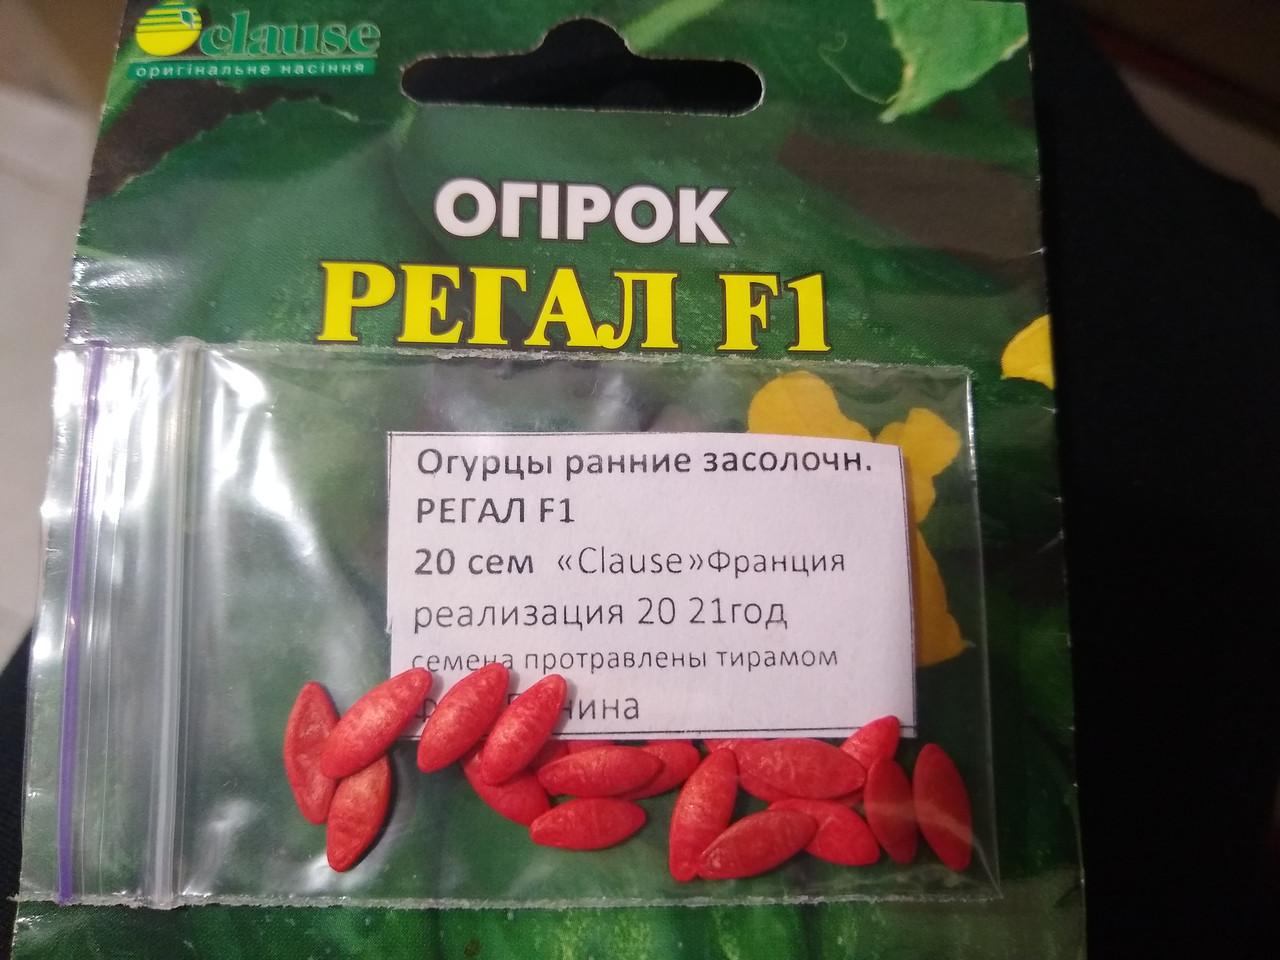 Семена огурца раннего  частично самоопыляемые гибрид Регал F1  20 семян, Clause Франция